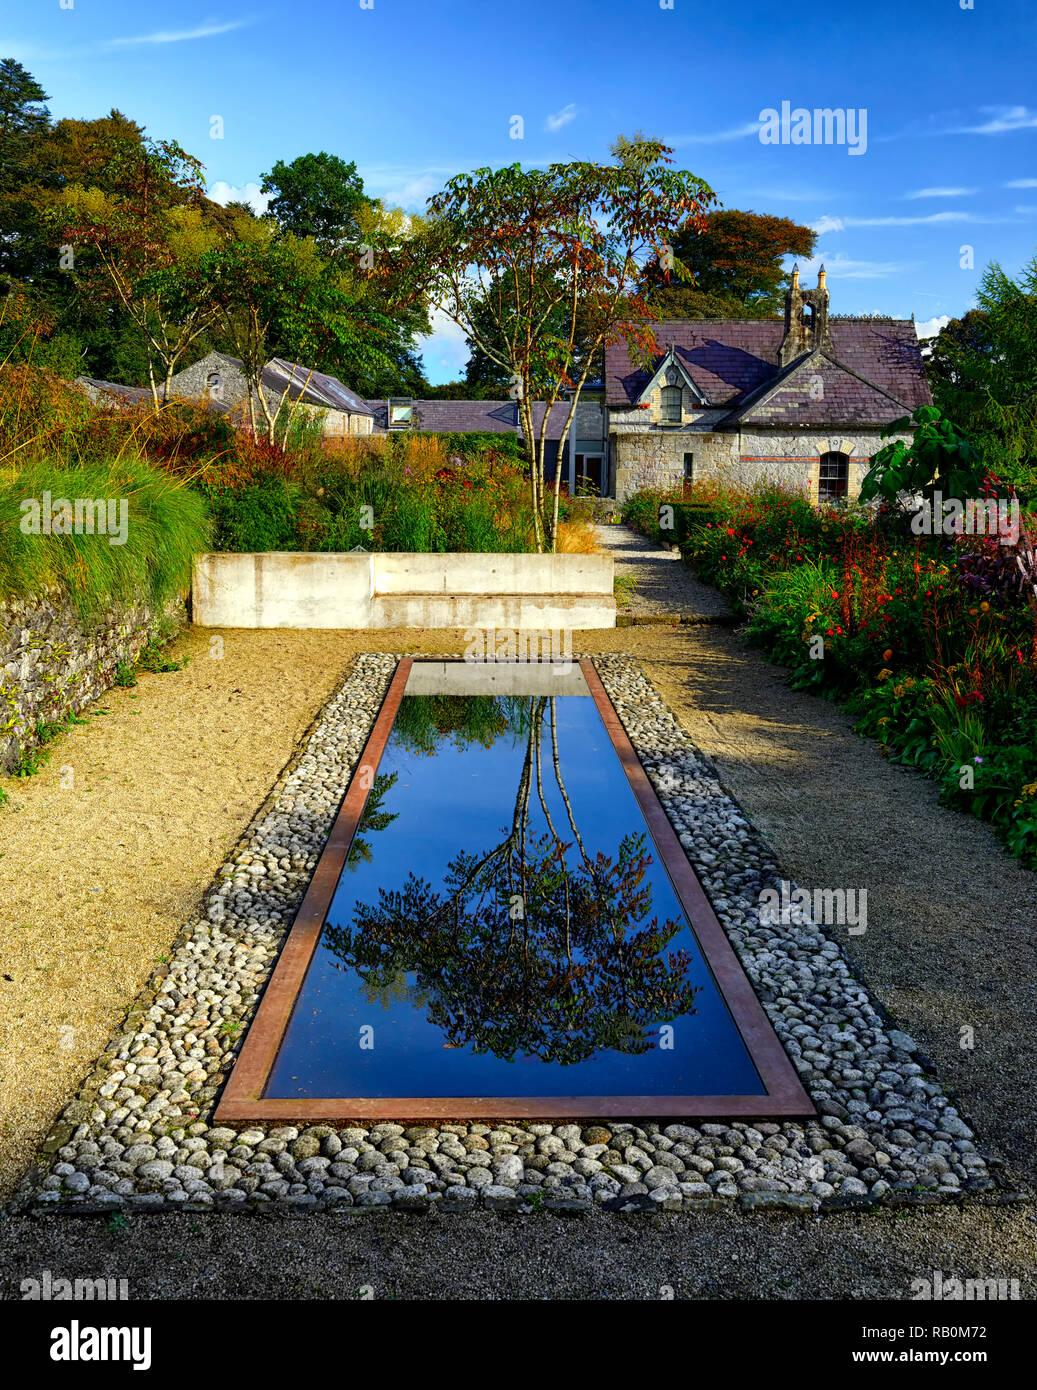 June Blake's Garden,Wicklow,Ireland,Garden,gardens,reflecting pool,pond,reflect,reflection,garden feature,design,water feature,Aralia echinocaulis,RM  - Stock Image